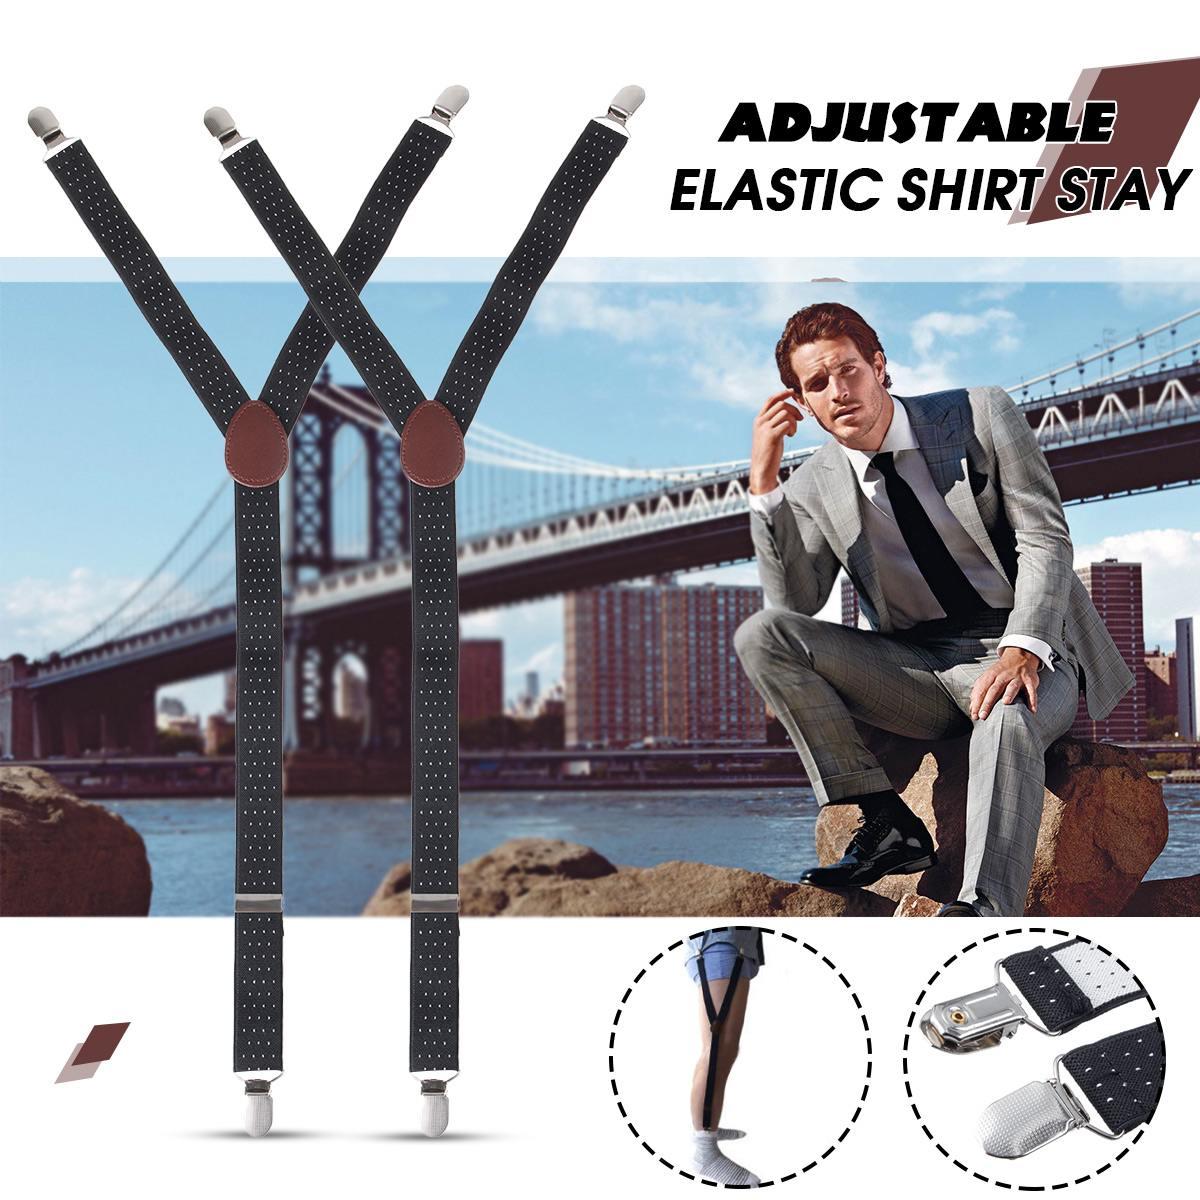 2pcs Y Shape Shirt Stays Garters Adjustable Elastic Garters Strap Non-slip Clamps Y-Shape Suspenders For Men Women